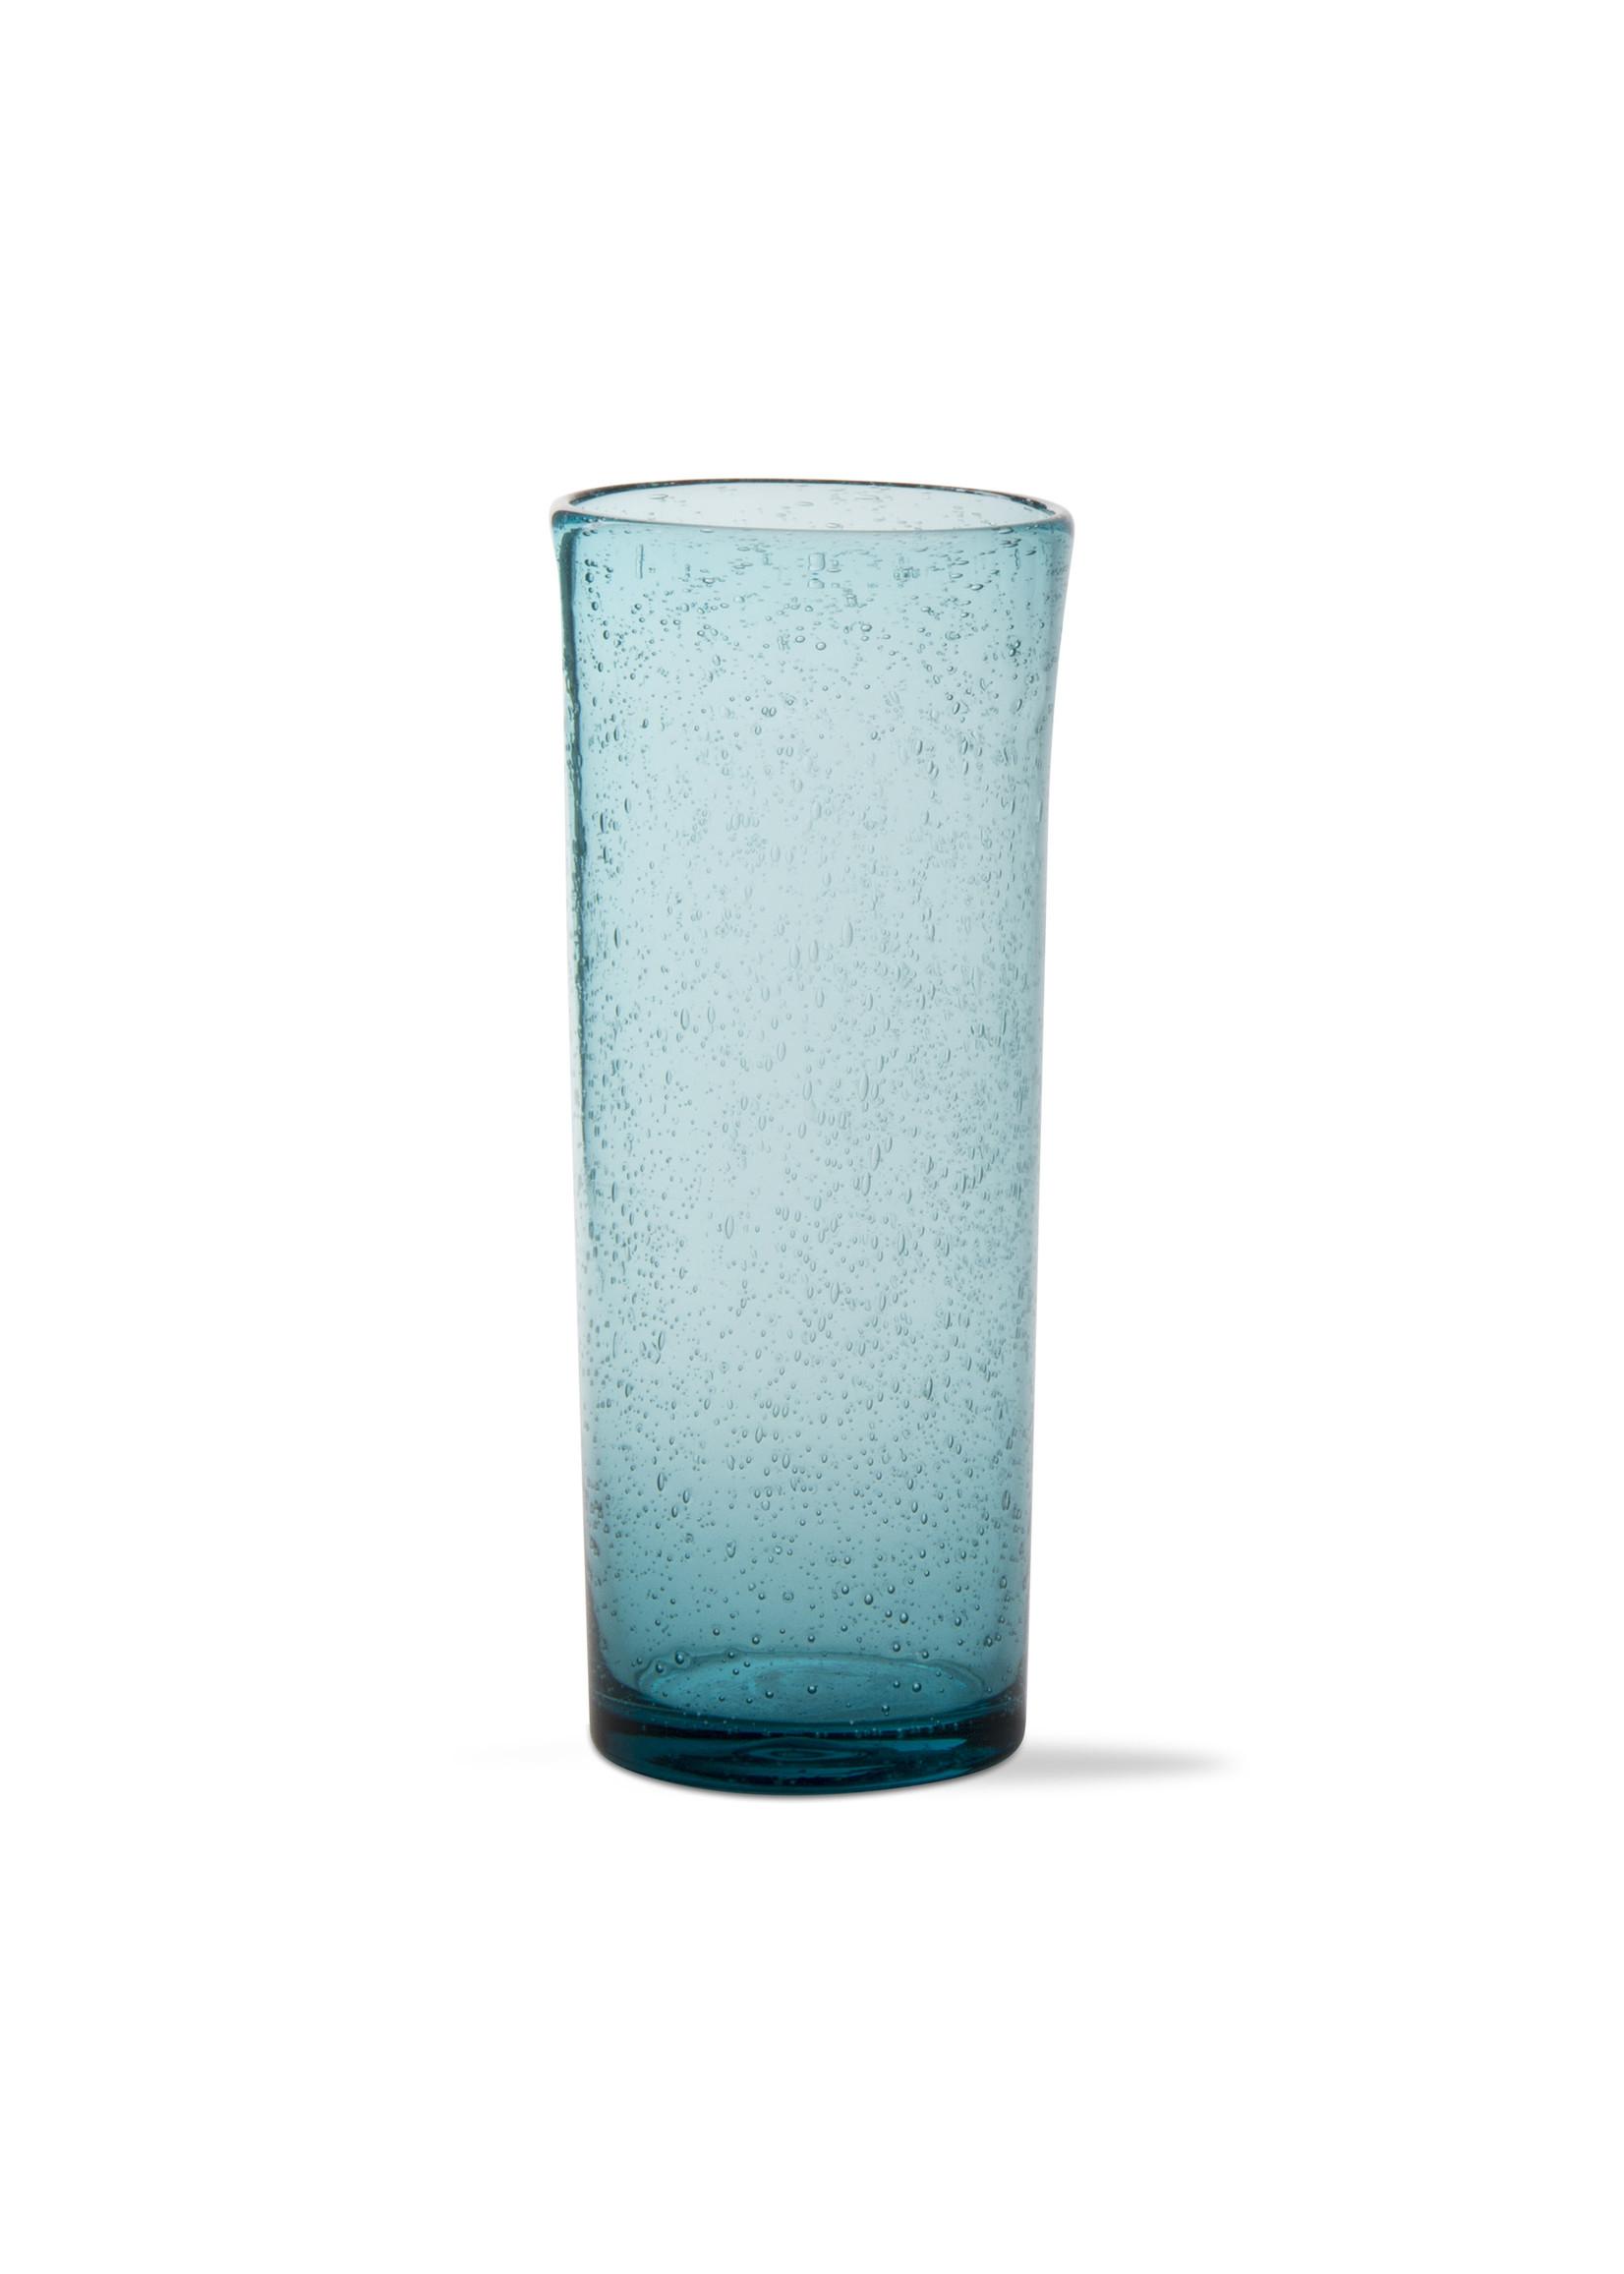 BUBBLE GLASS TALL BLOODY MARY AQUA GLASS